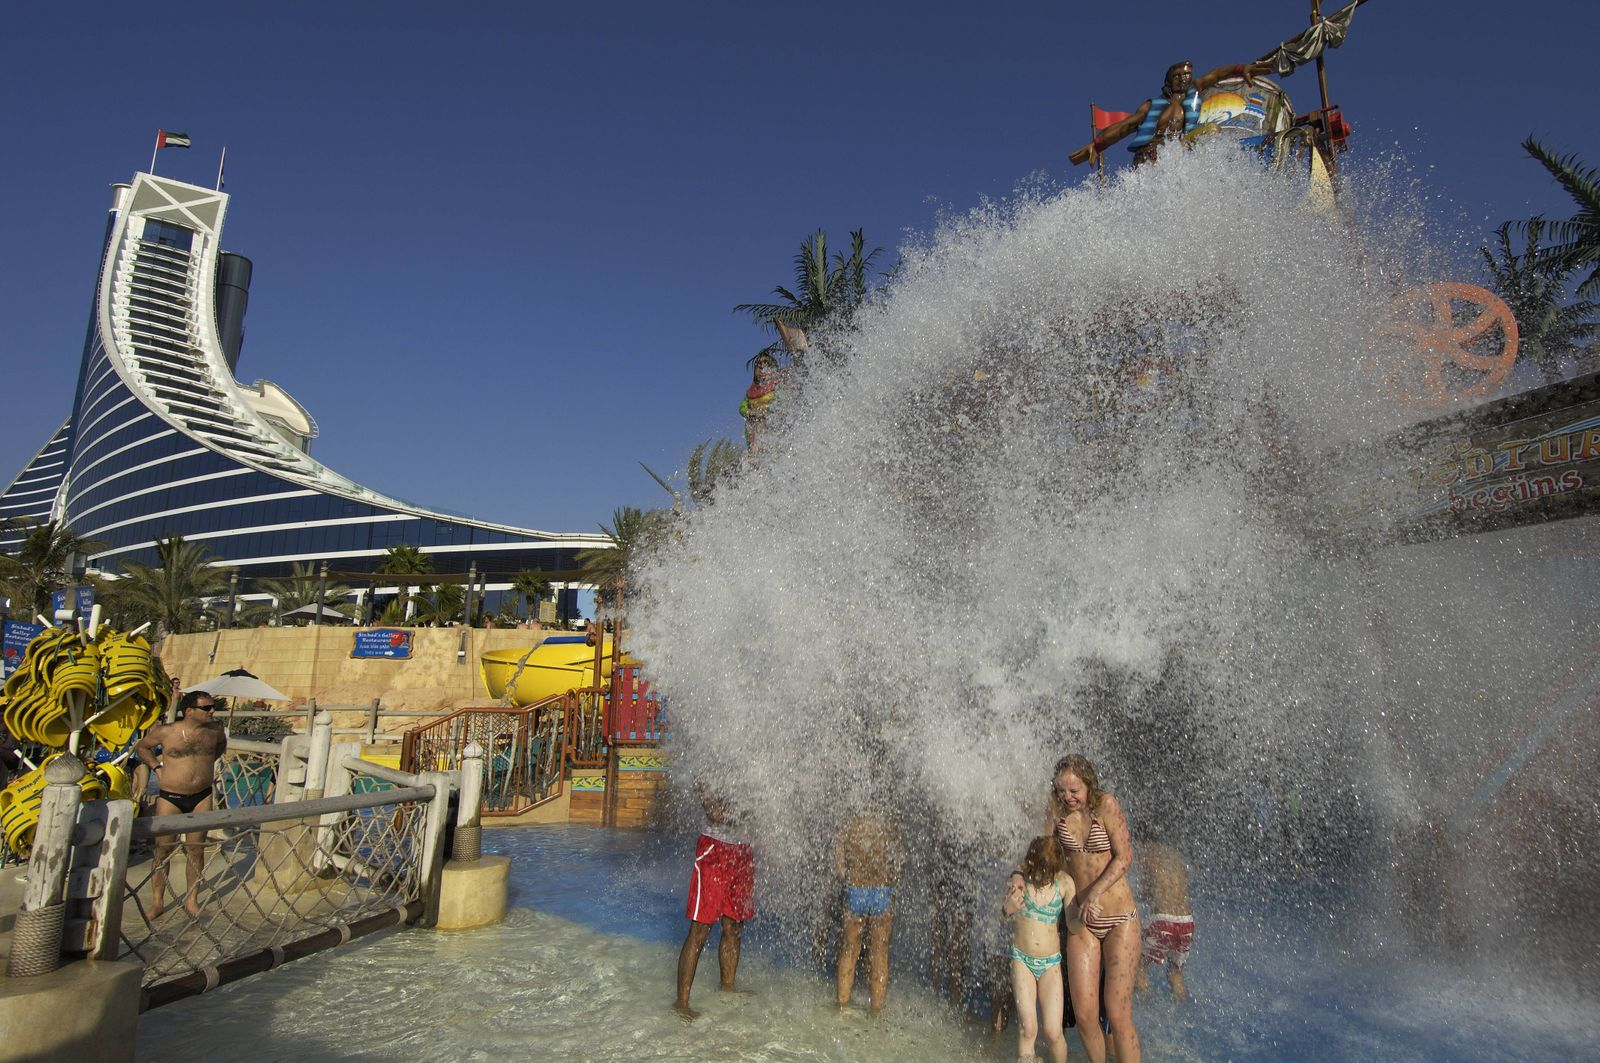 ARABIA A wave of water at the Wild Wadi Water Park Jumeirah Beach Dubai United Arab Emirates Feb